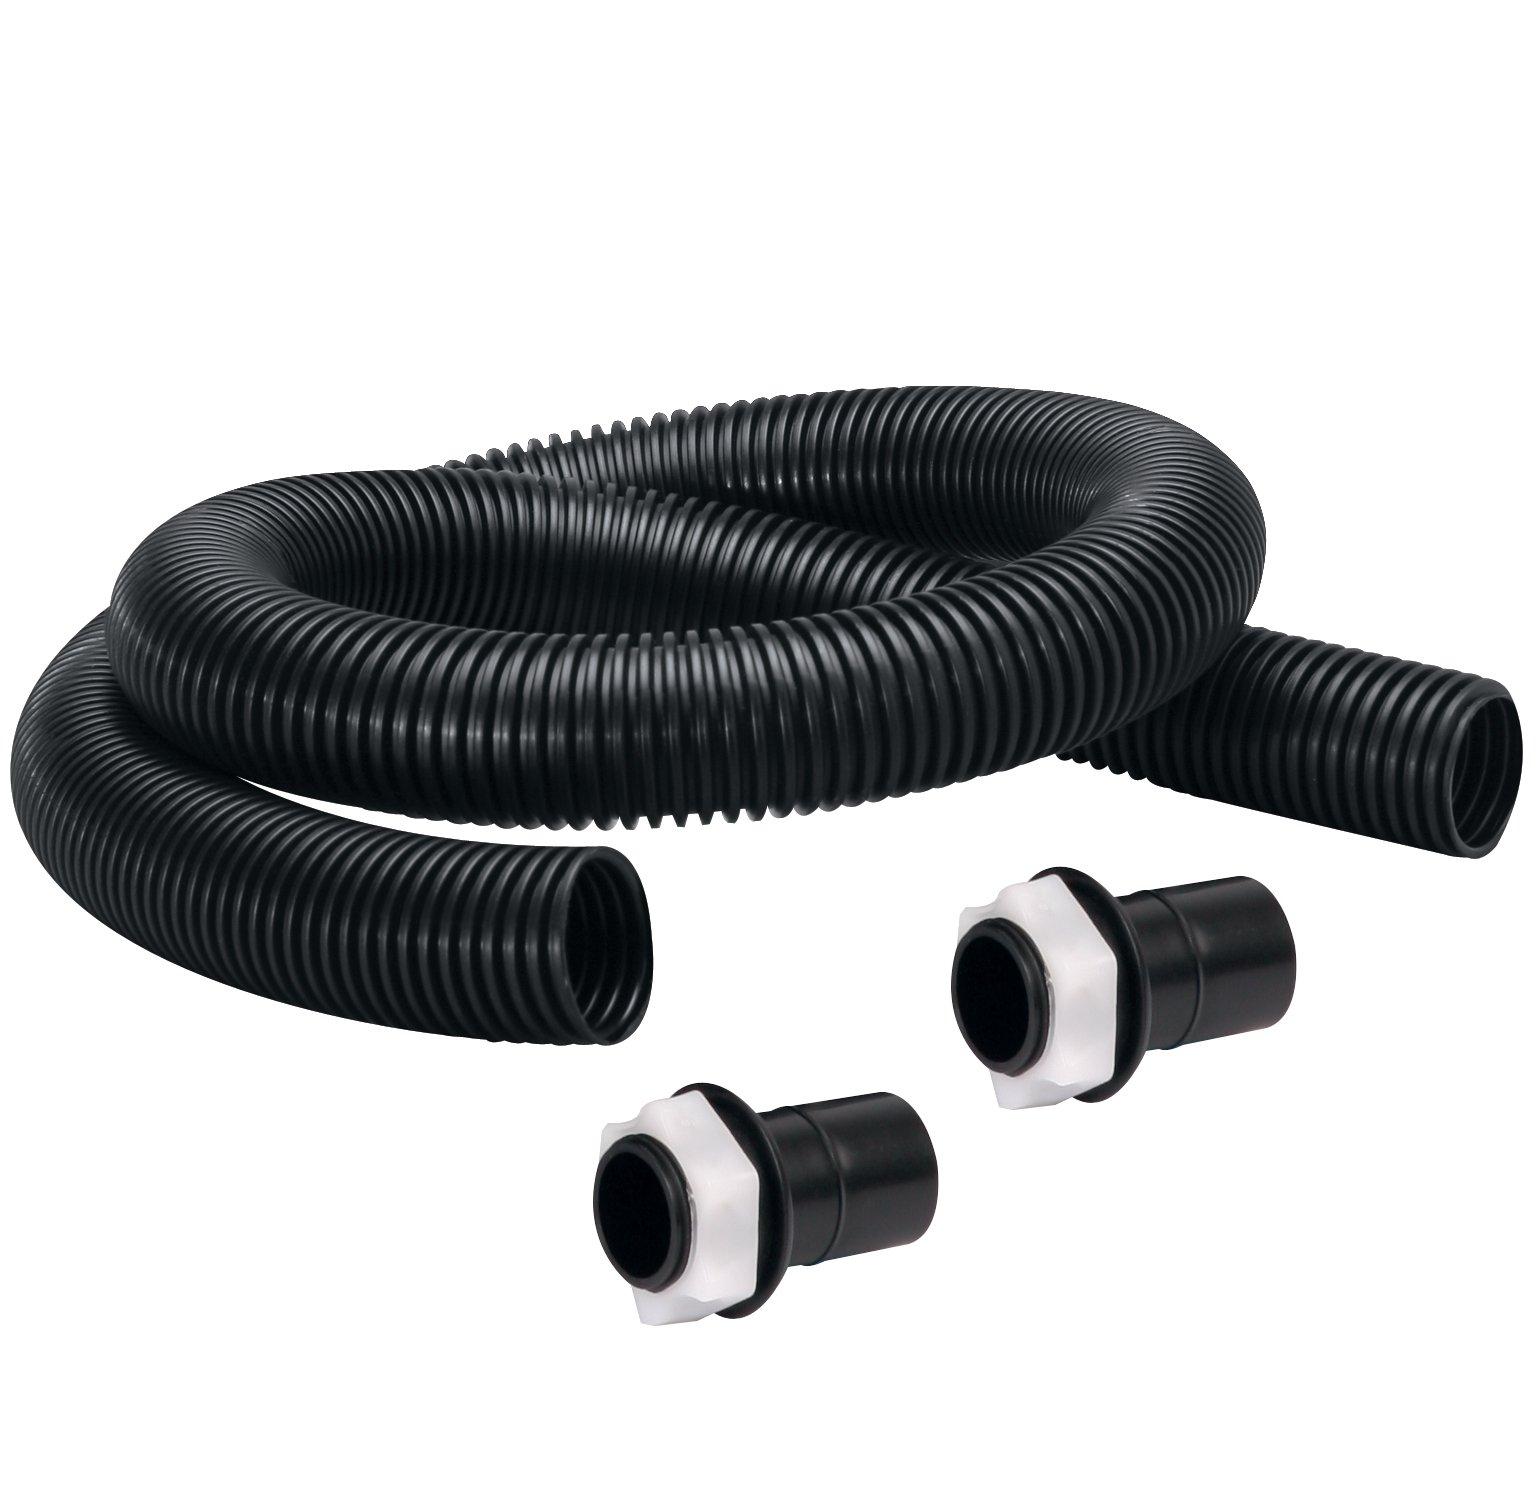 Fiskars Rain Barrel Connector Kit (59606935).